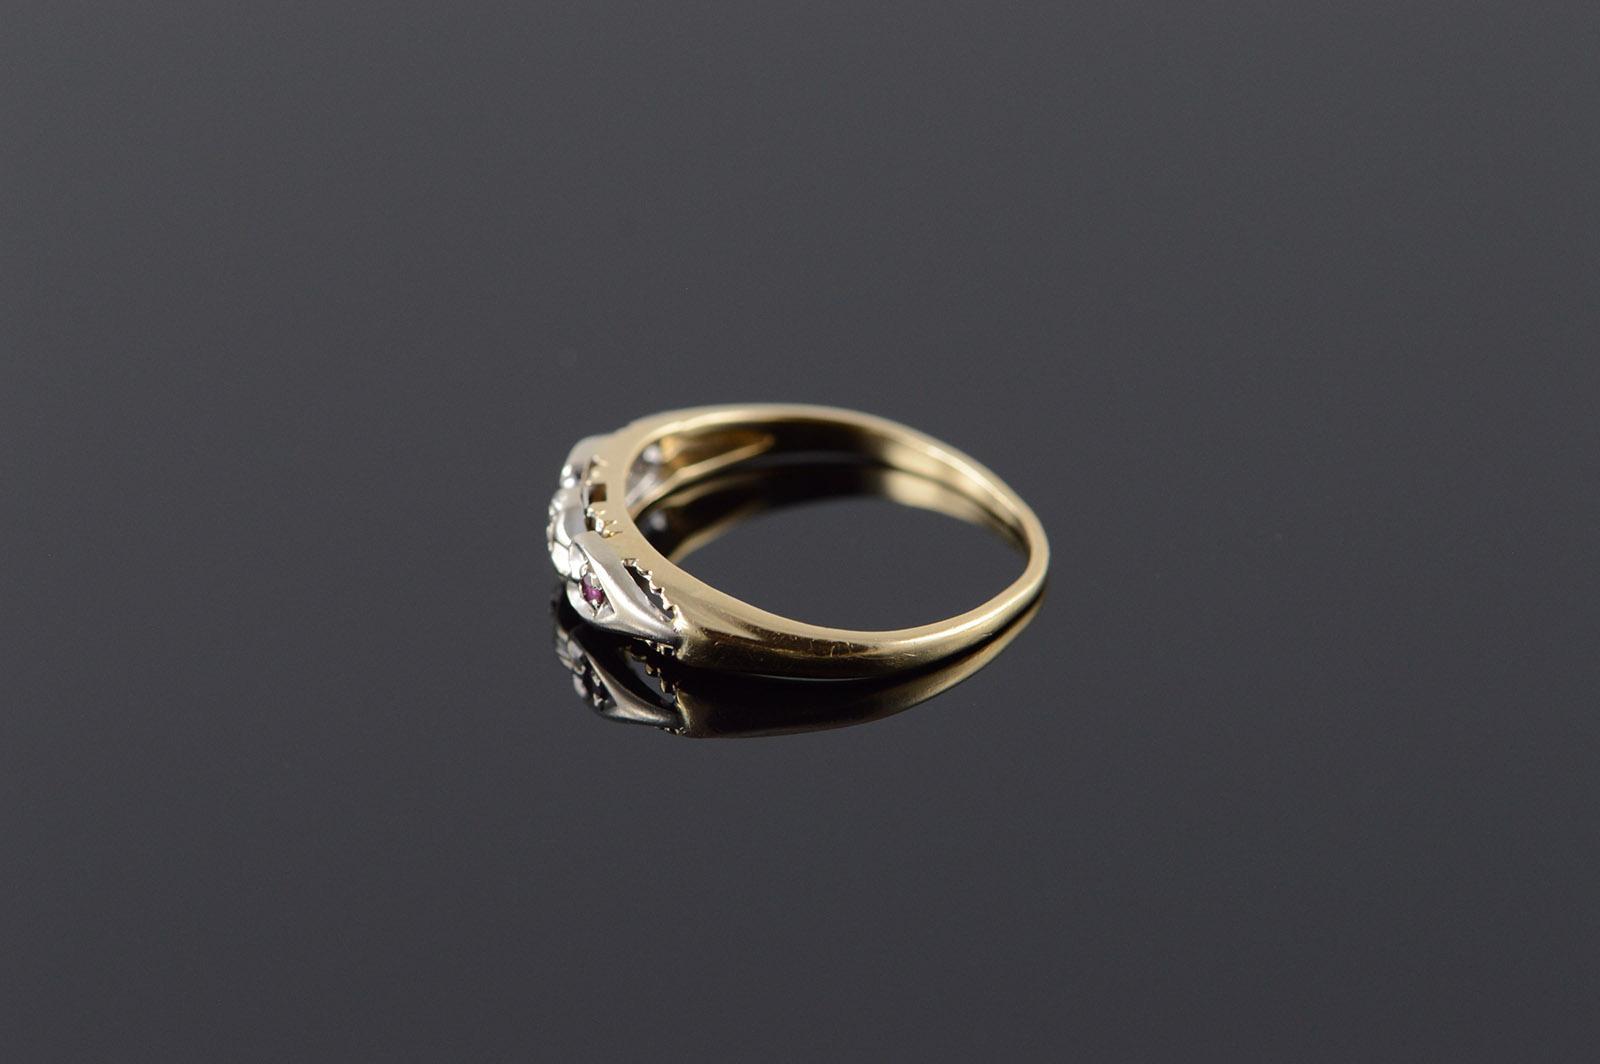 14k 1950 S Genuine Diamond Two Tone Vintage Wedding Band Yellow Gold Ring Size 5 75